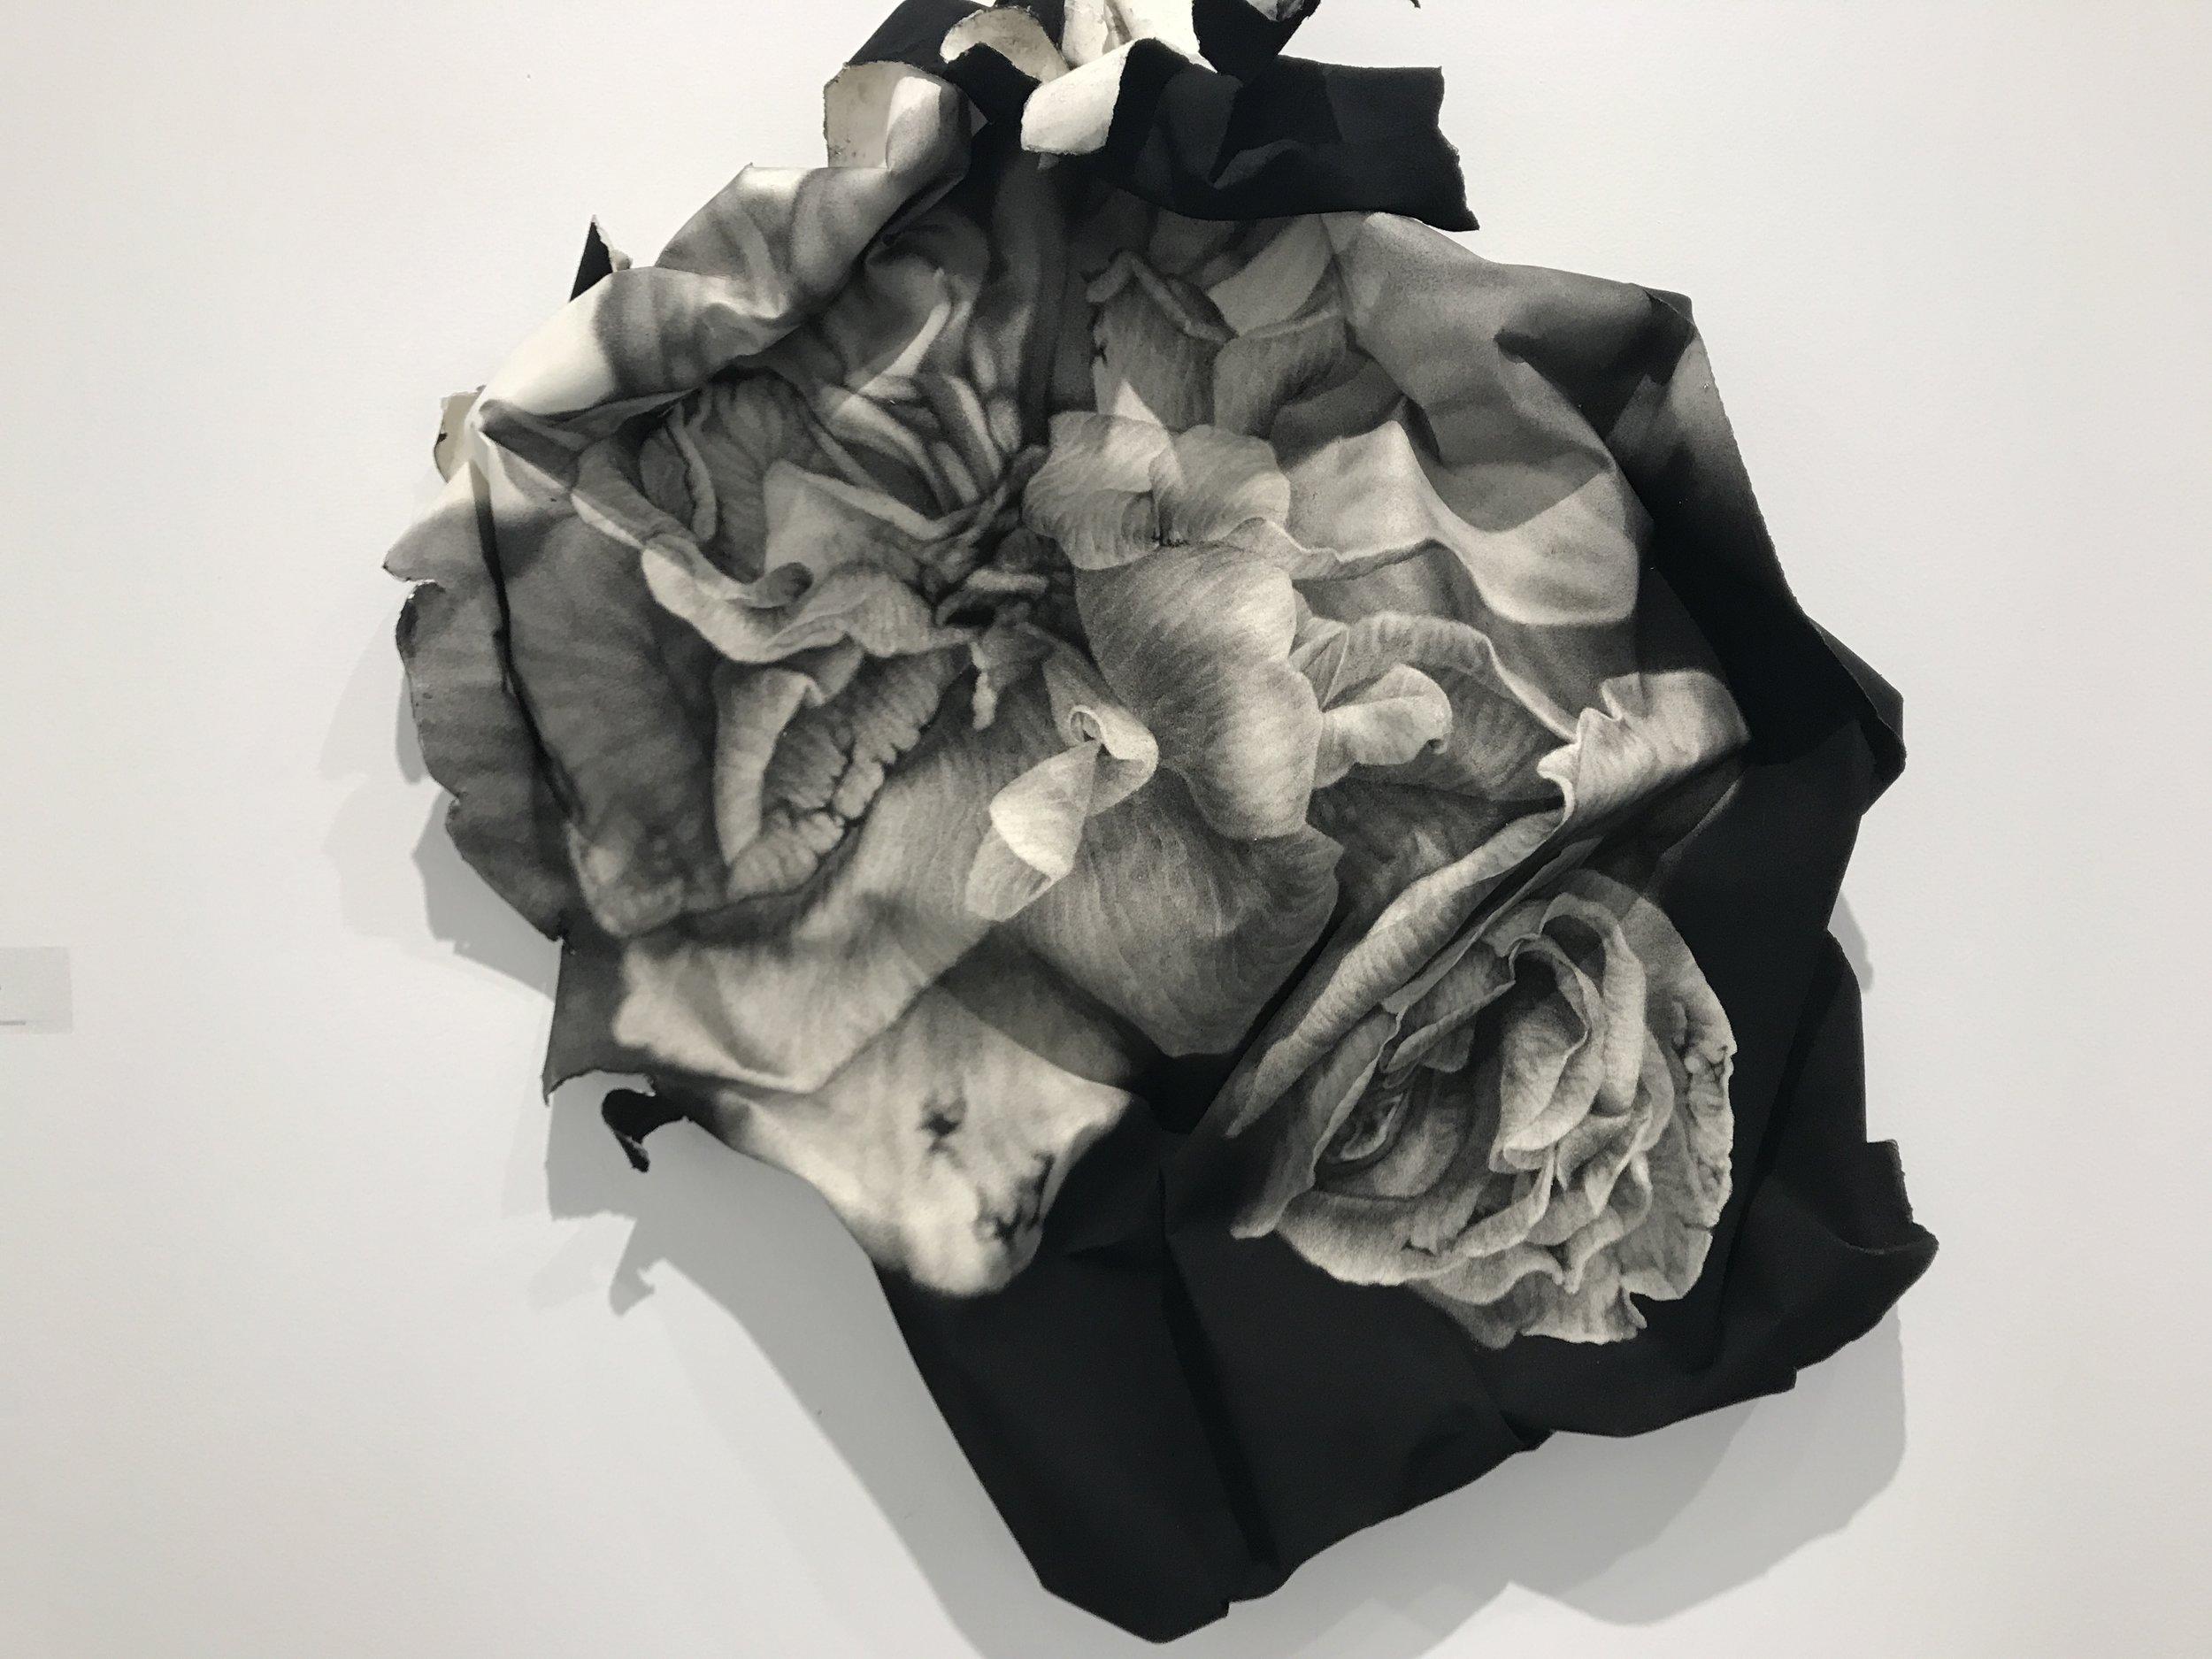 In conte crayon on rag paper,  Crushed Roses , 2017, by Josph Stashkevetch, Von Lintel Gallery, LA, CA.